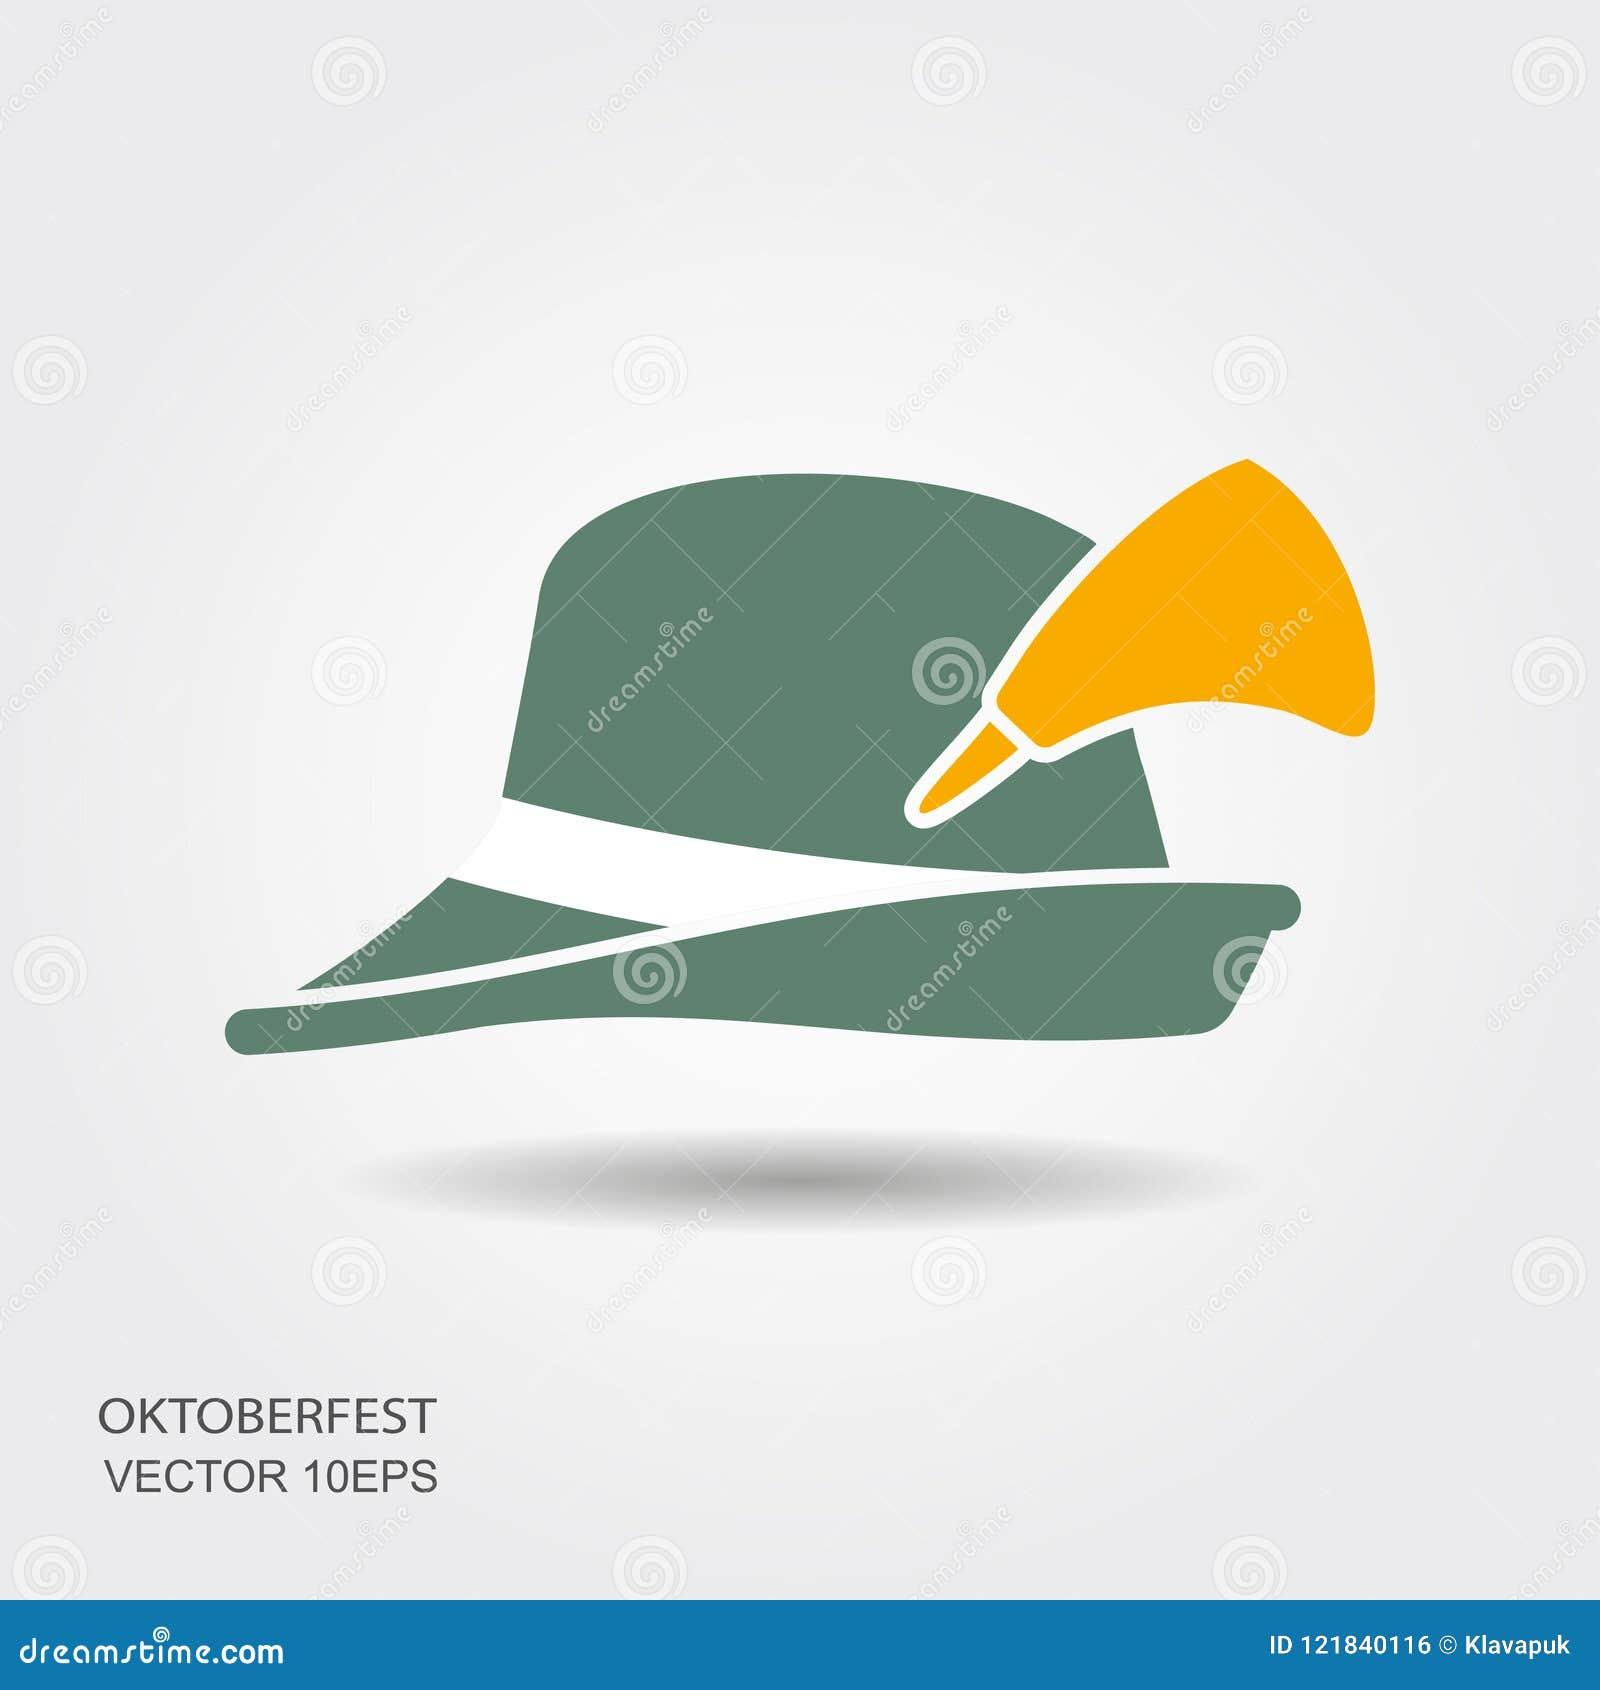 10e0ffc94e6 Flat Design Green Oktoberfest Hat On White Background Stock Vector ...